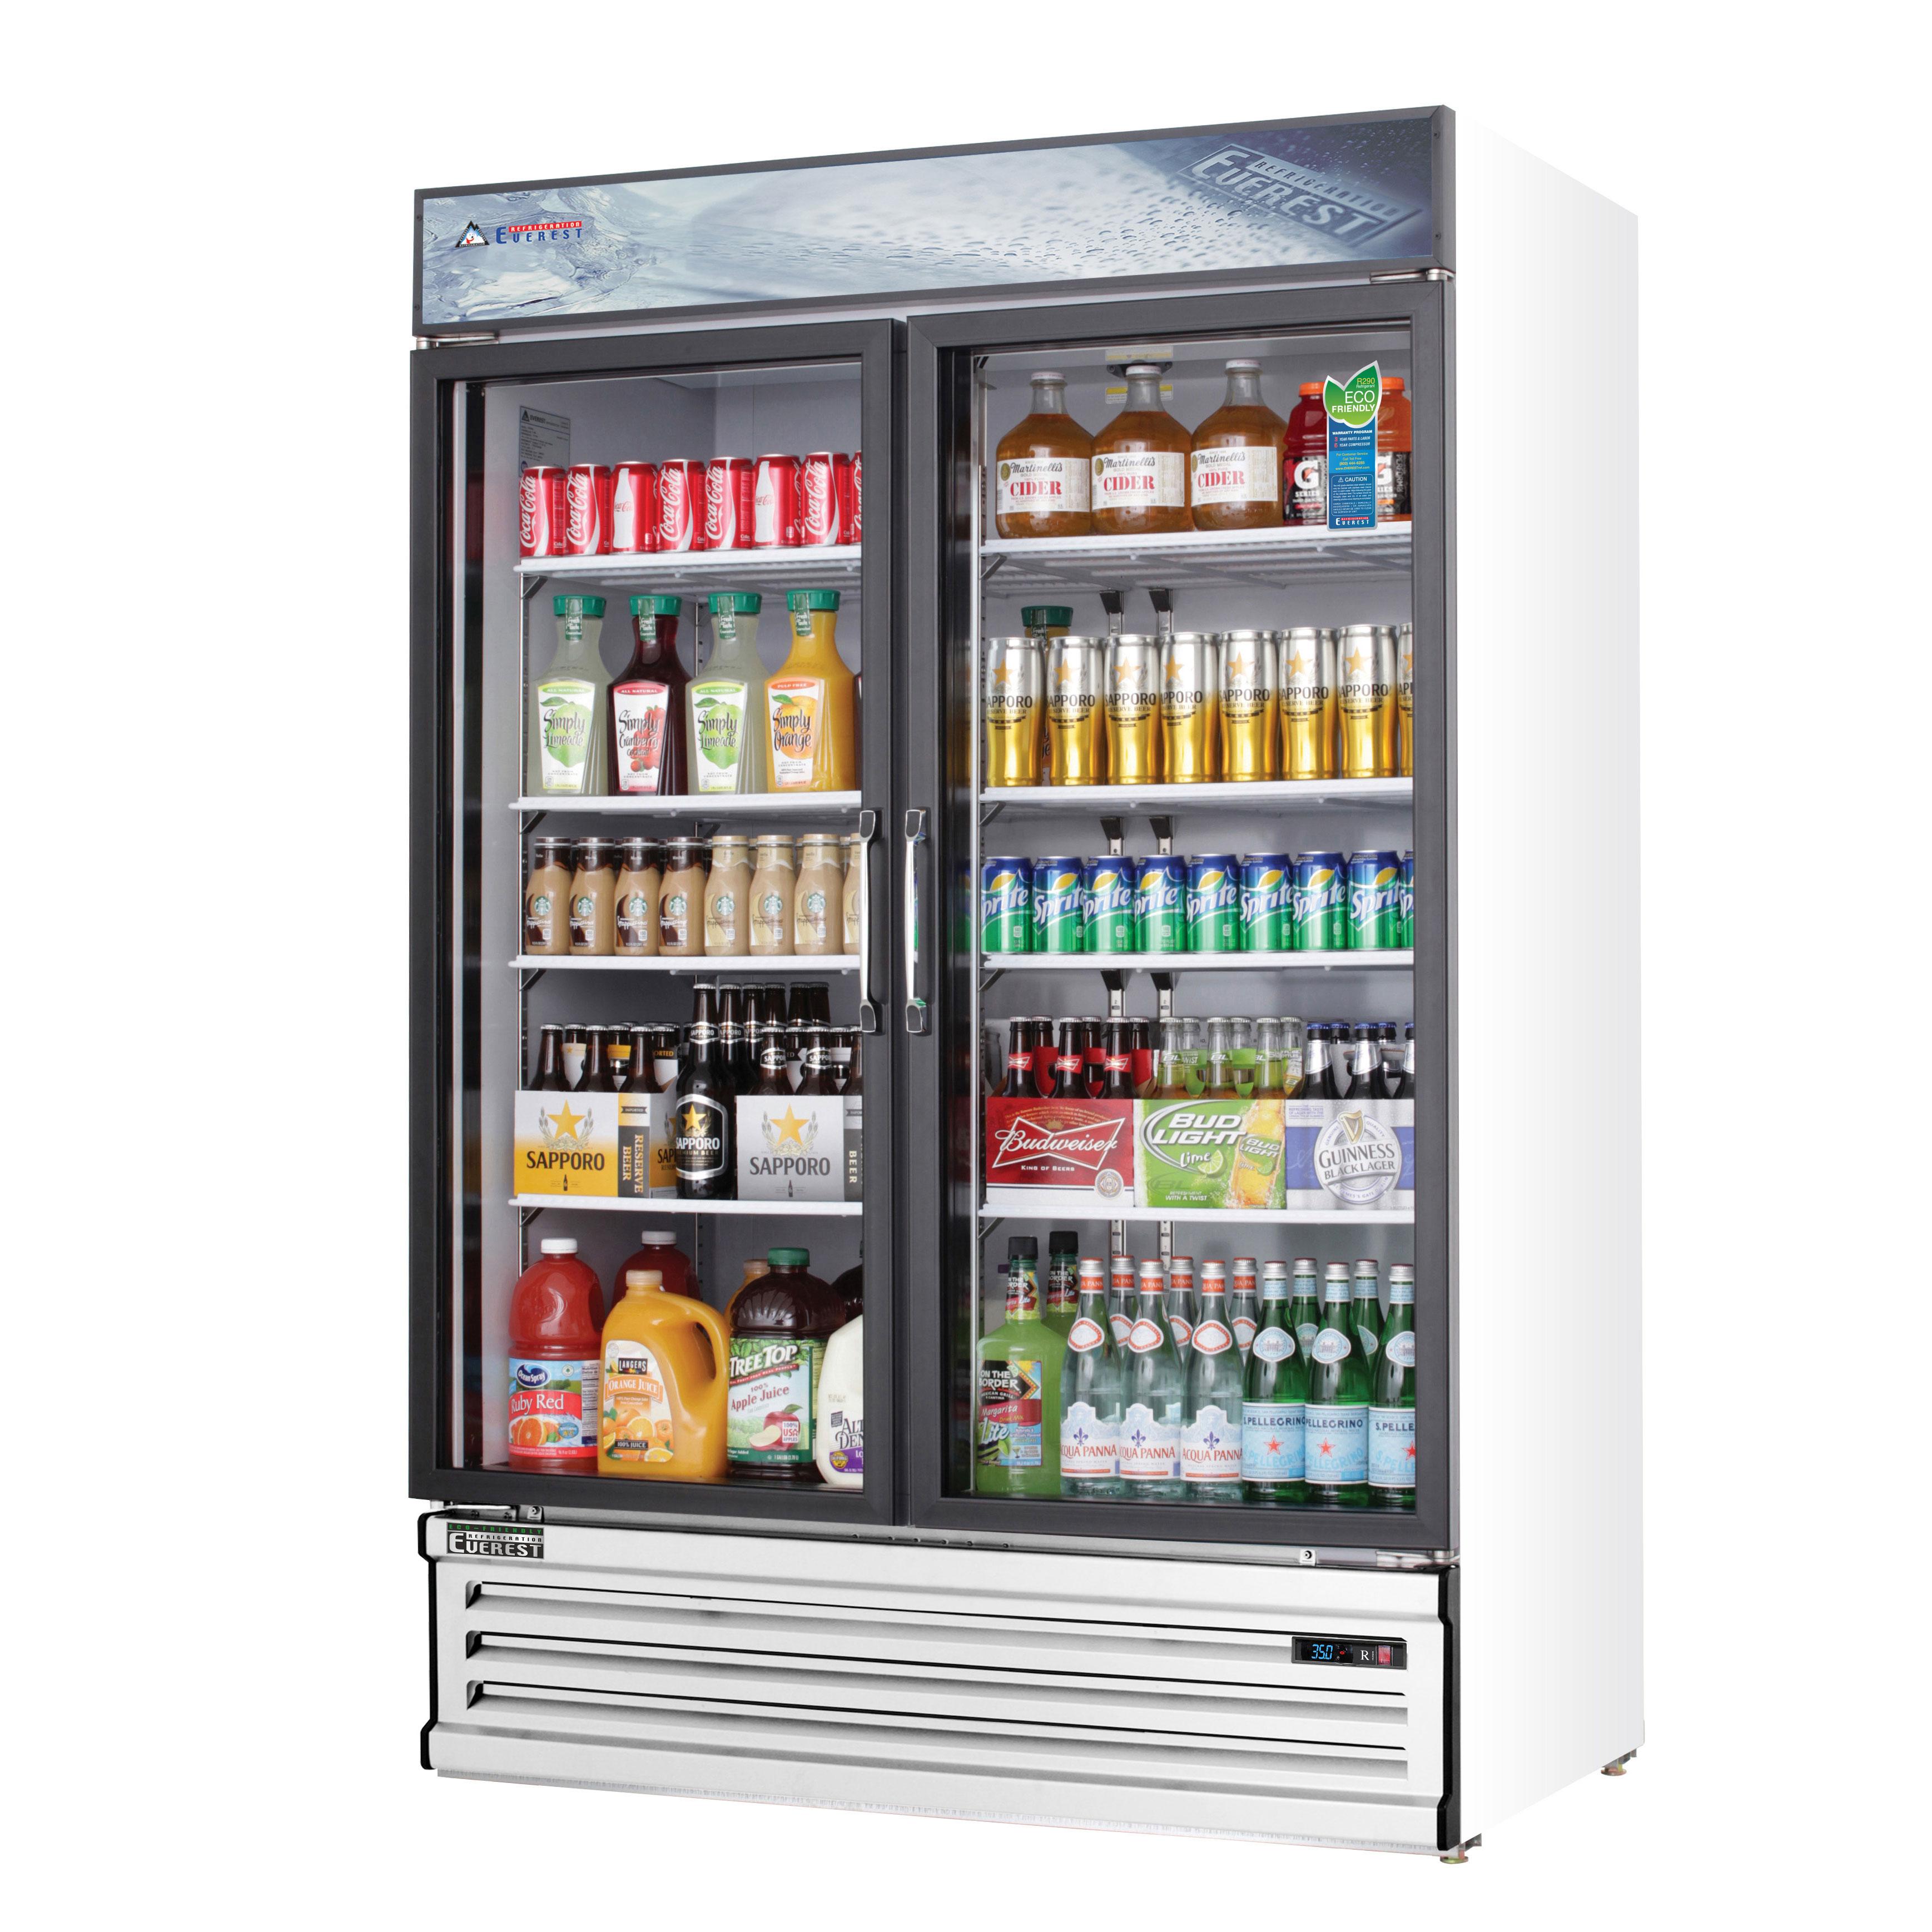 Everest Refrigeration EMSGR48 refrigerator, merchandiser